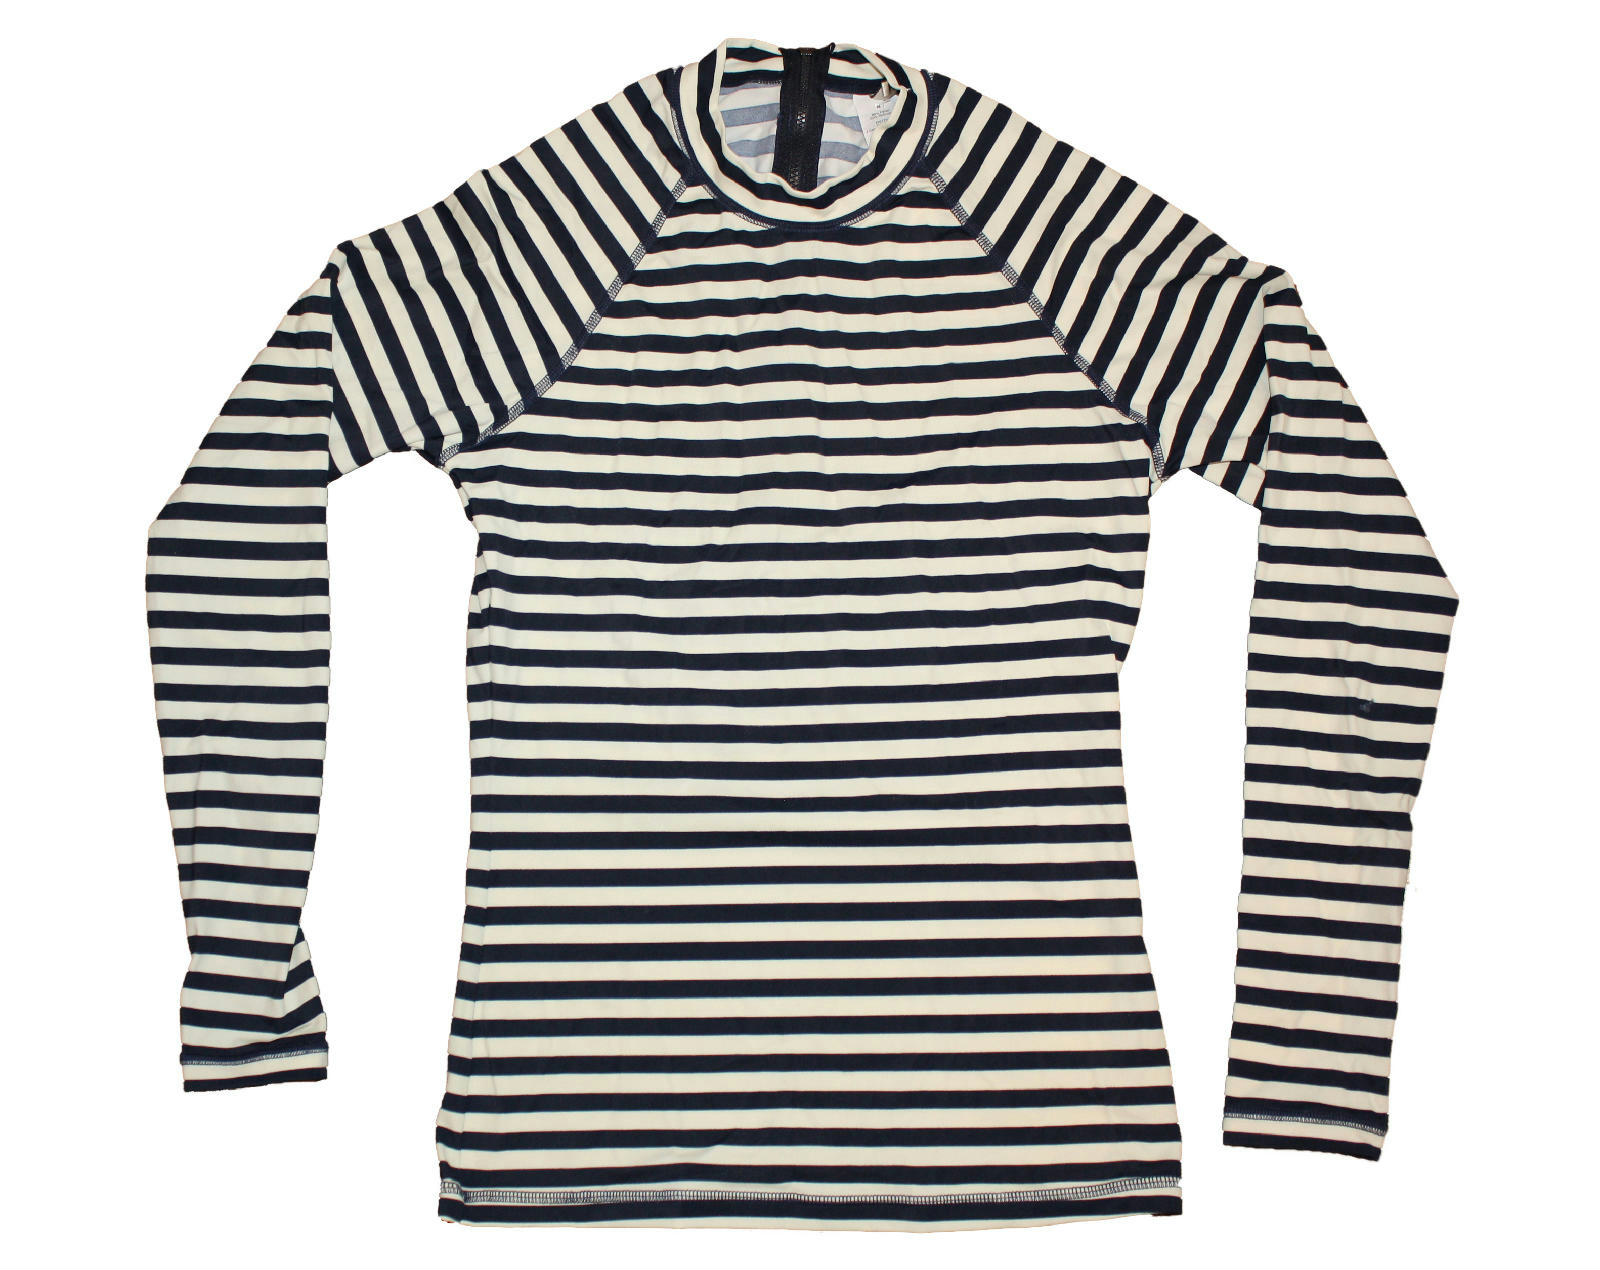 jcrew stripe rash guard swim shirt coverup upf c3161 75 navy ivory xs ebay. Black Bedroom Furniture Sets. Home Design Ideas